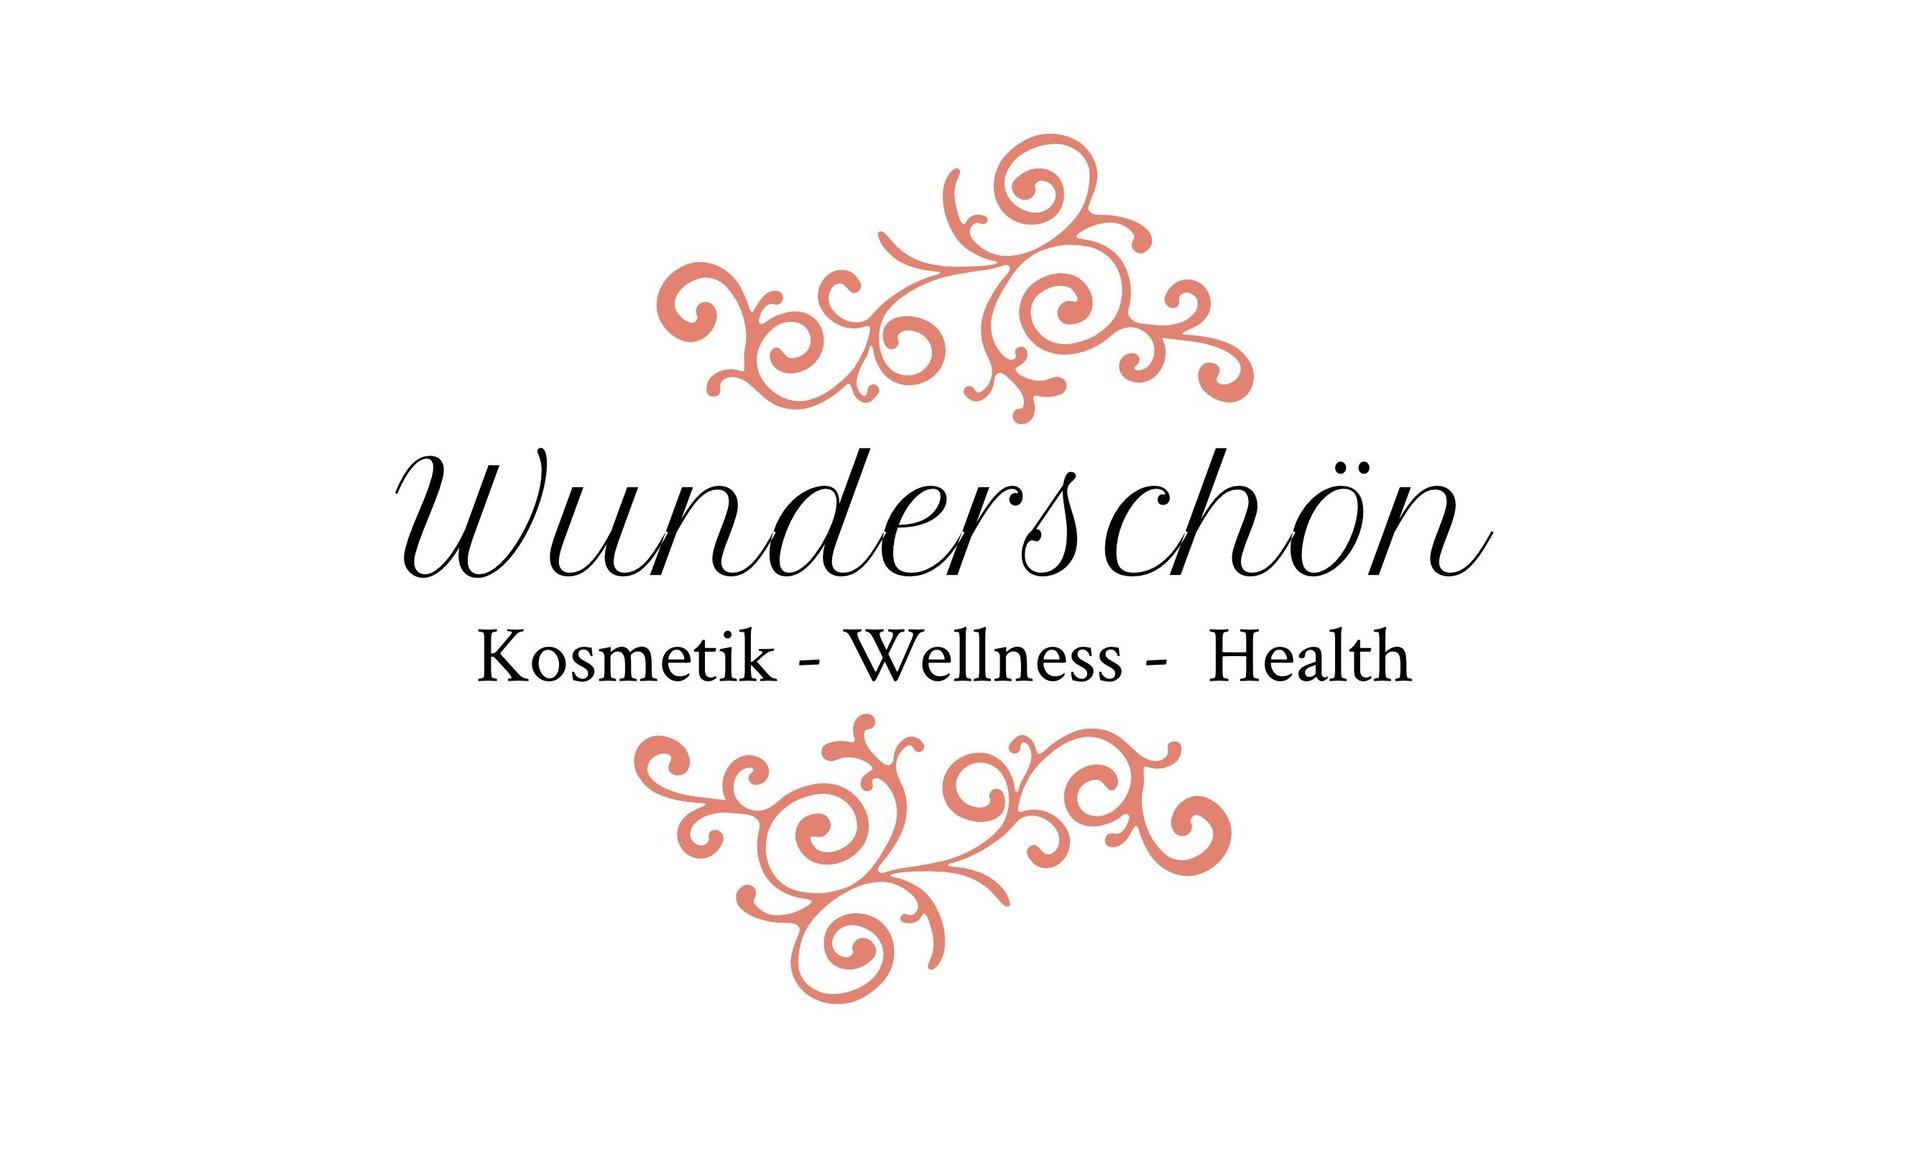 4bfdf14341ae5d Preise bei Kosmetik Wunderschön   Kosmetik, Wellness, Health